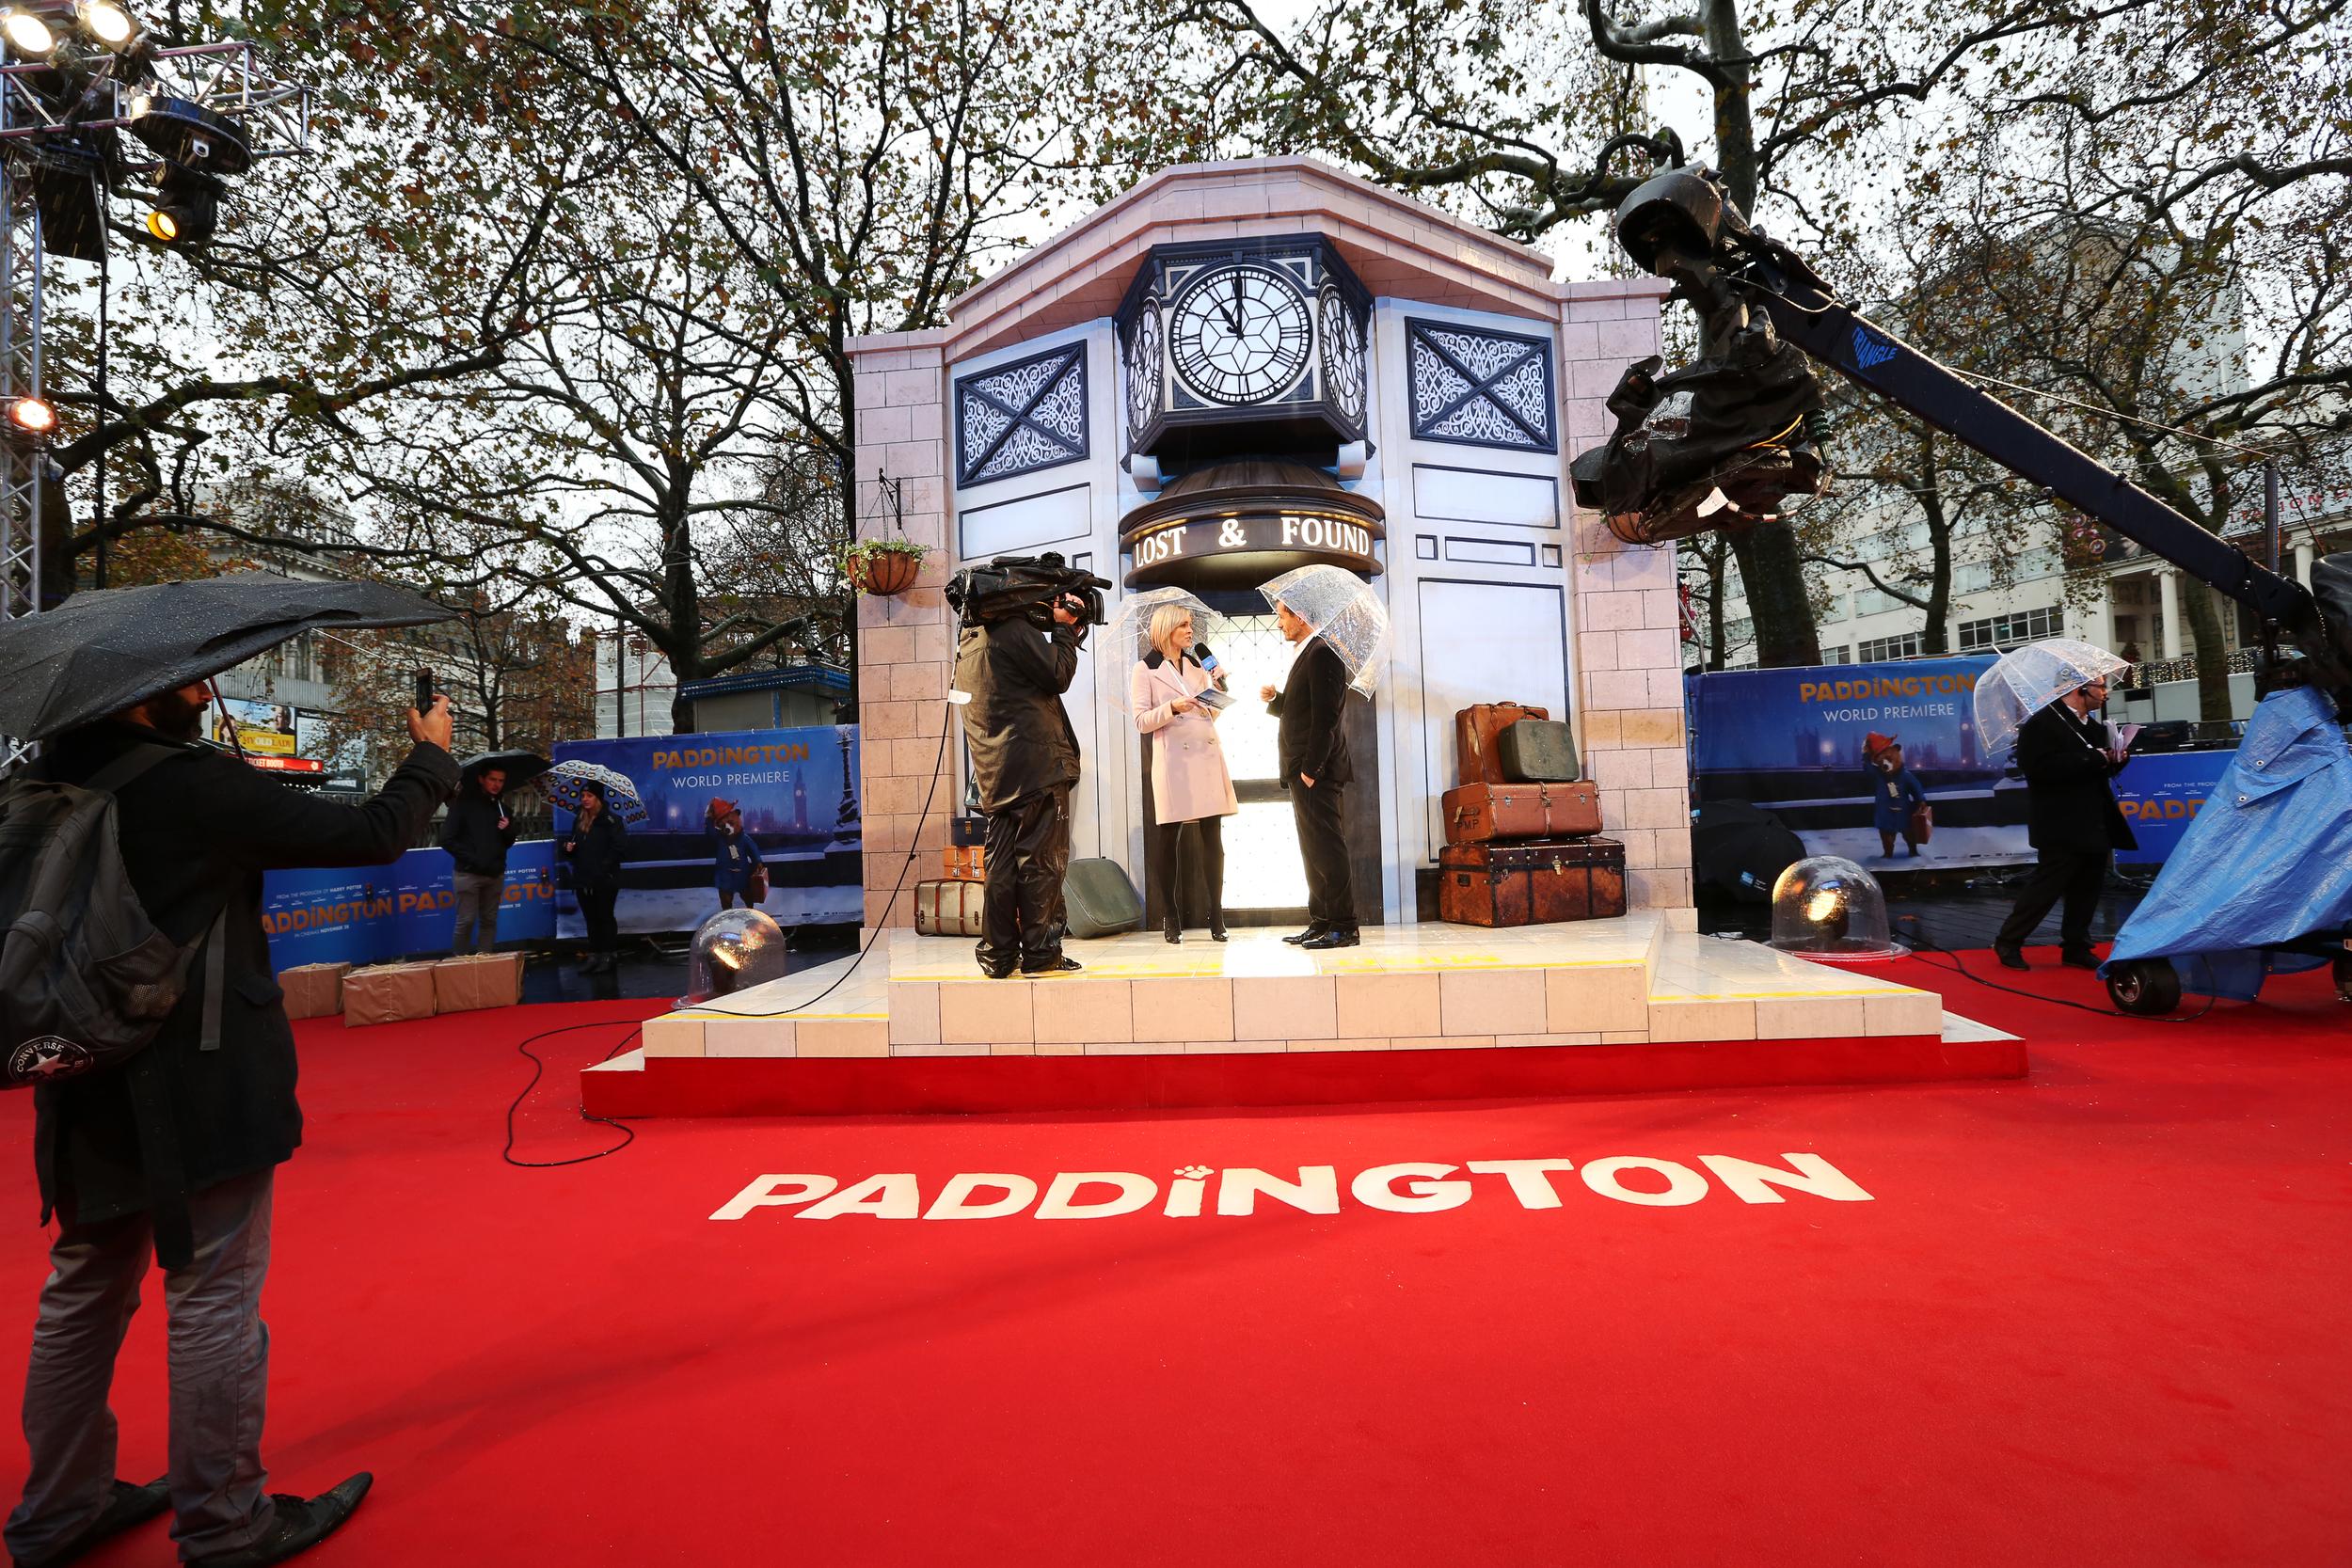 HEART Event Design paddington london